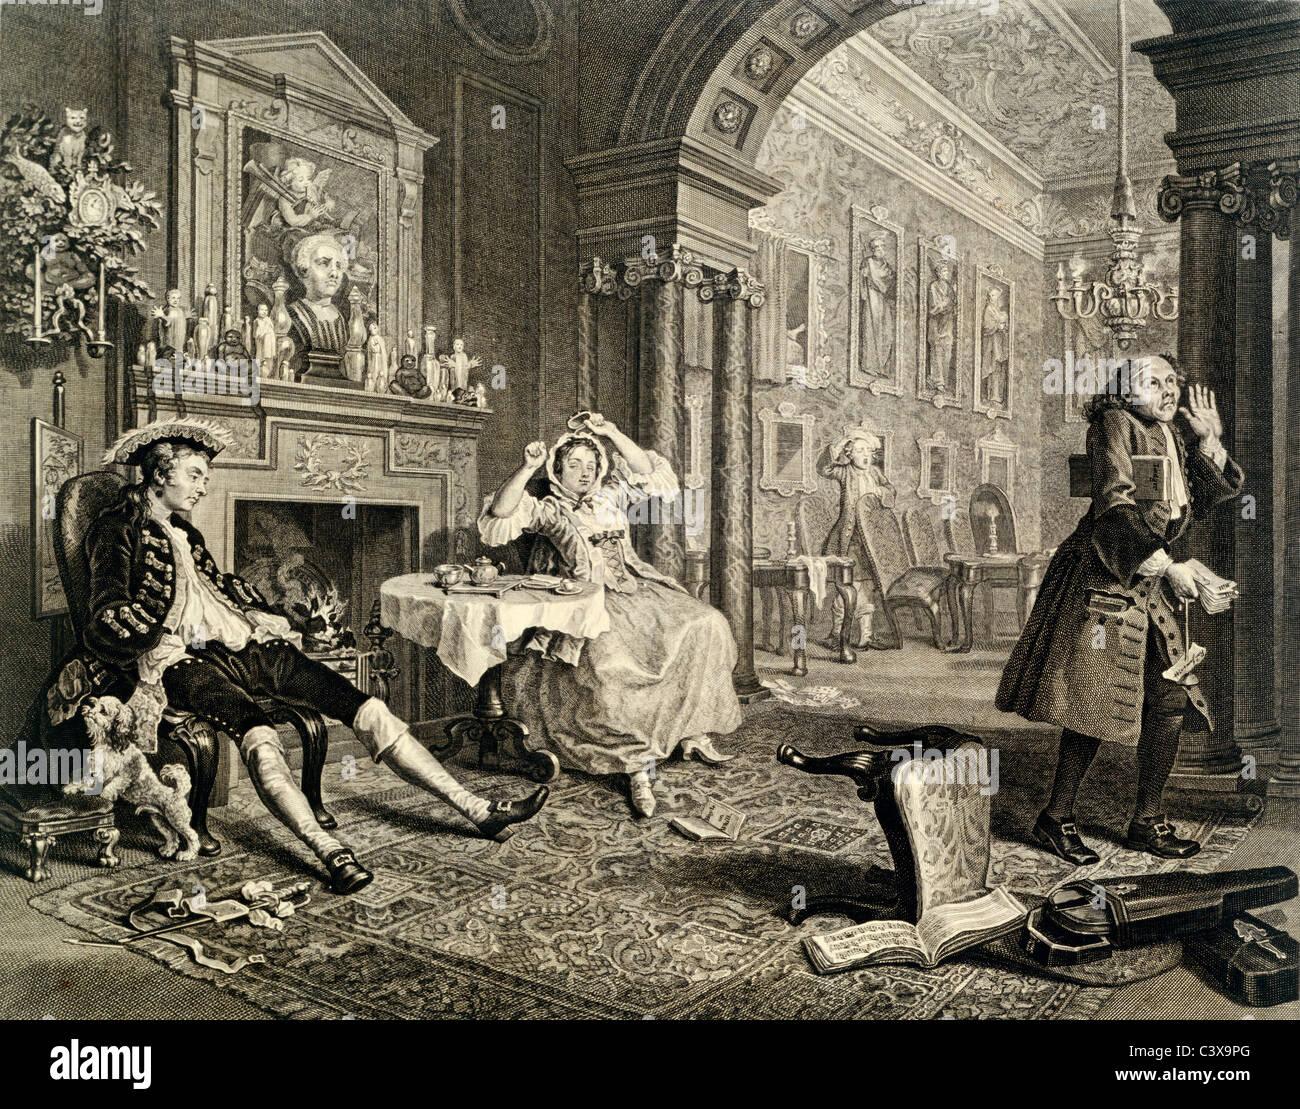 Wedding group, photo F. Driver. Bradford, England, 19th century - Stock Image